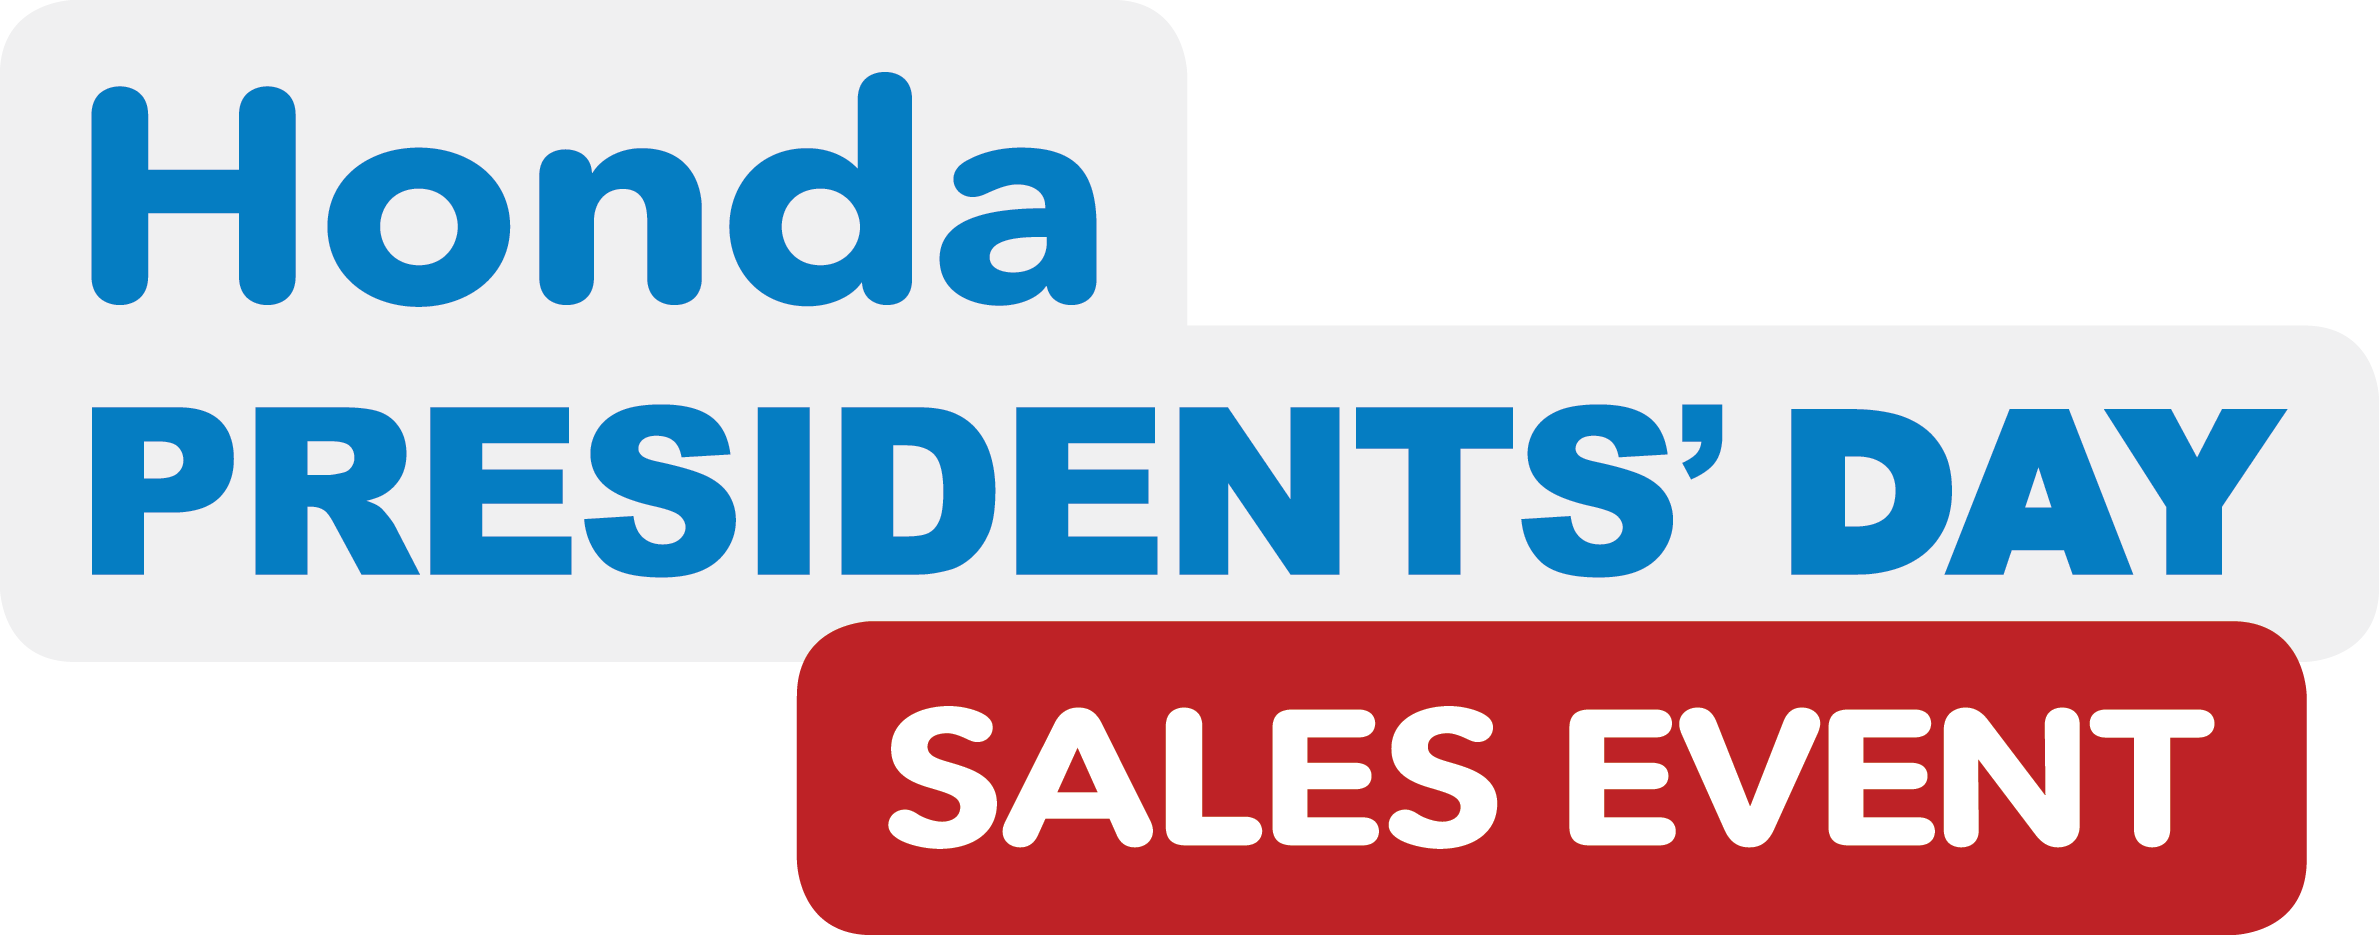 Honda Presidents' Day Sales Event